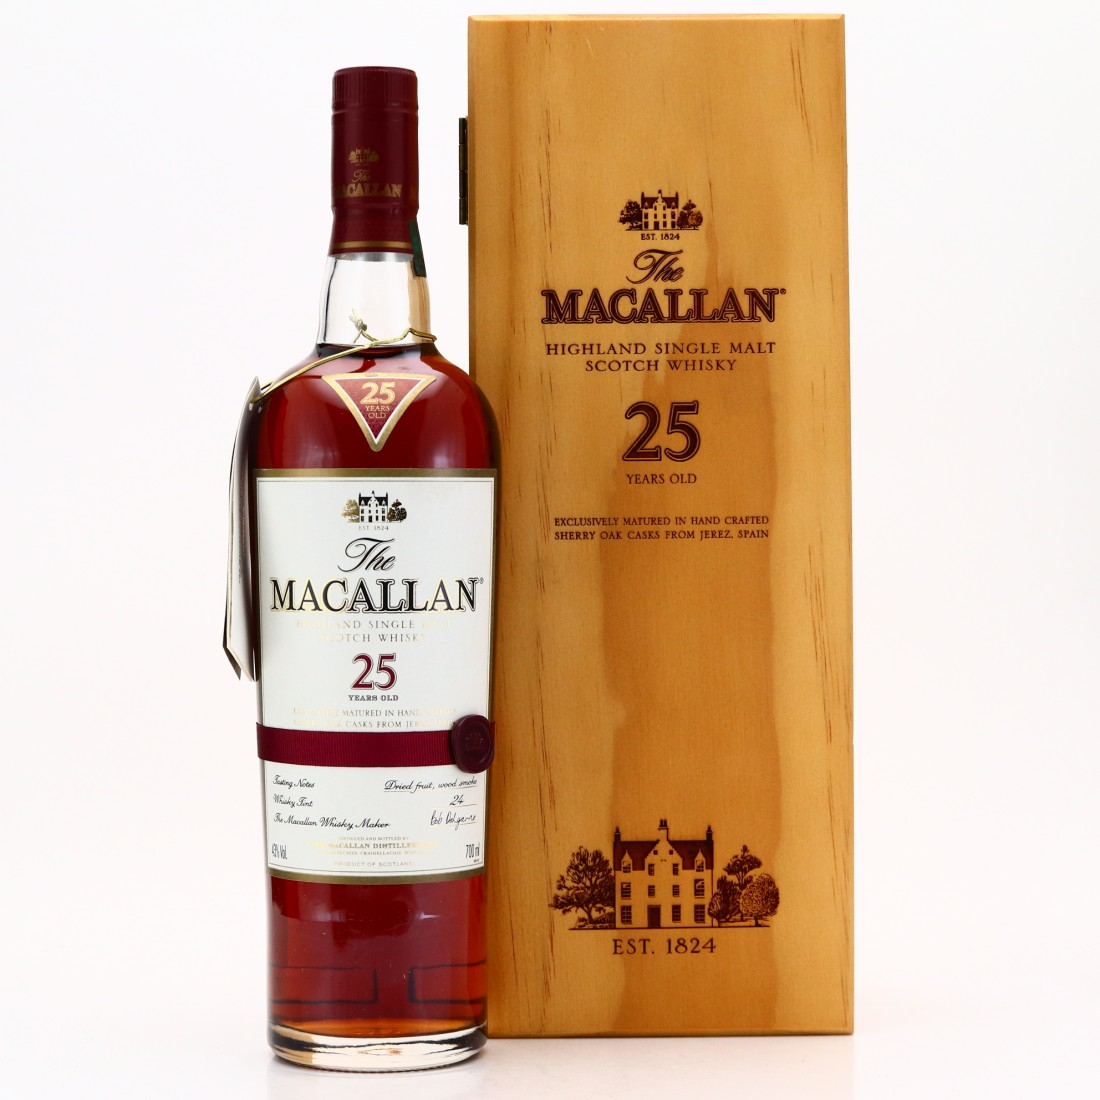 Macallan 25 Year Old pre-2018